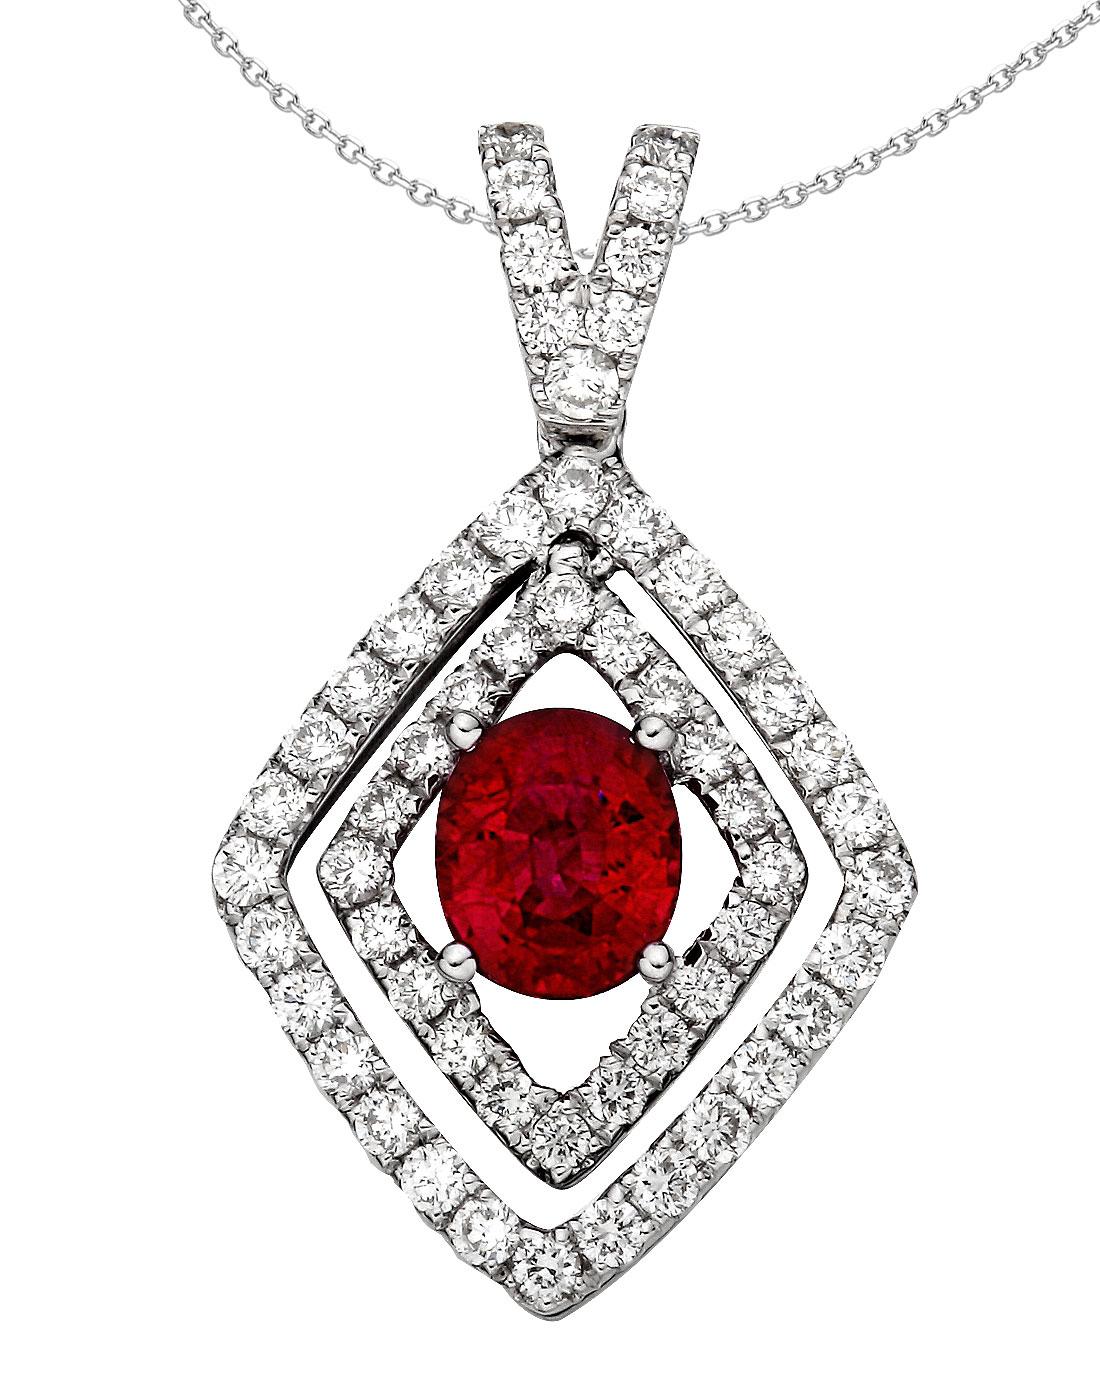 18k金镶红宝石钻石吊坠